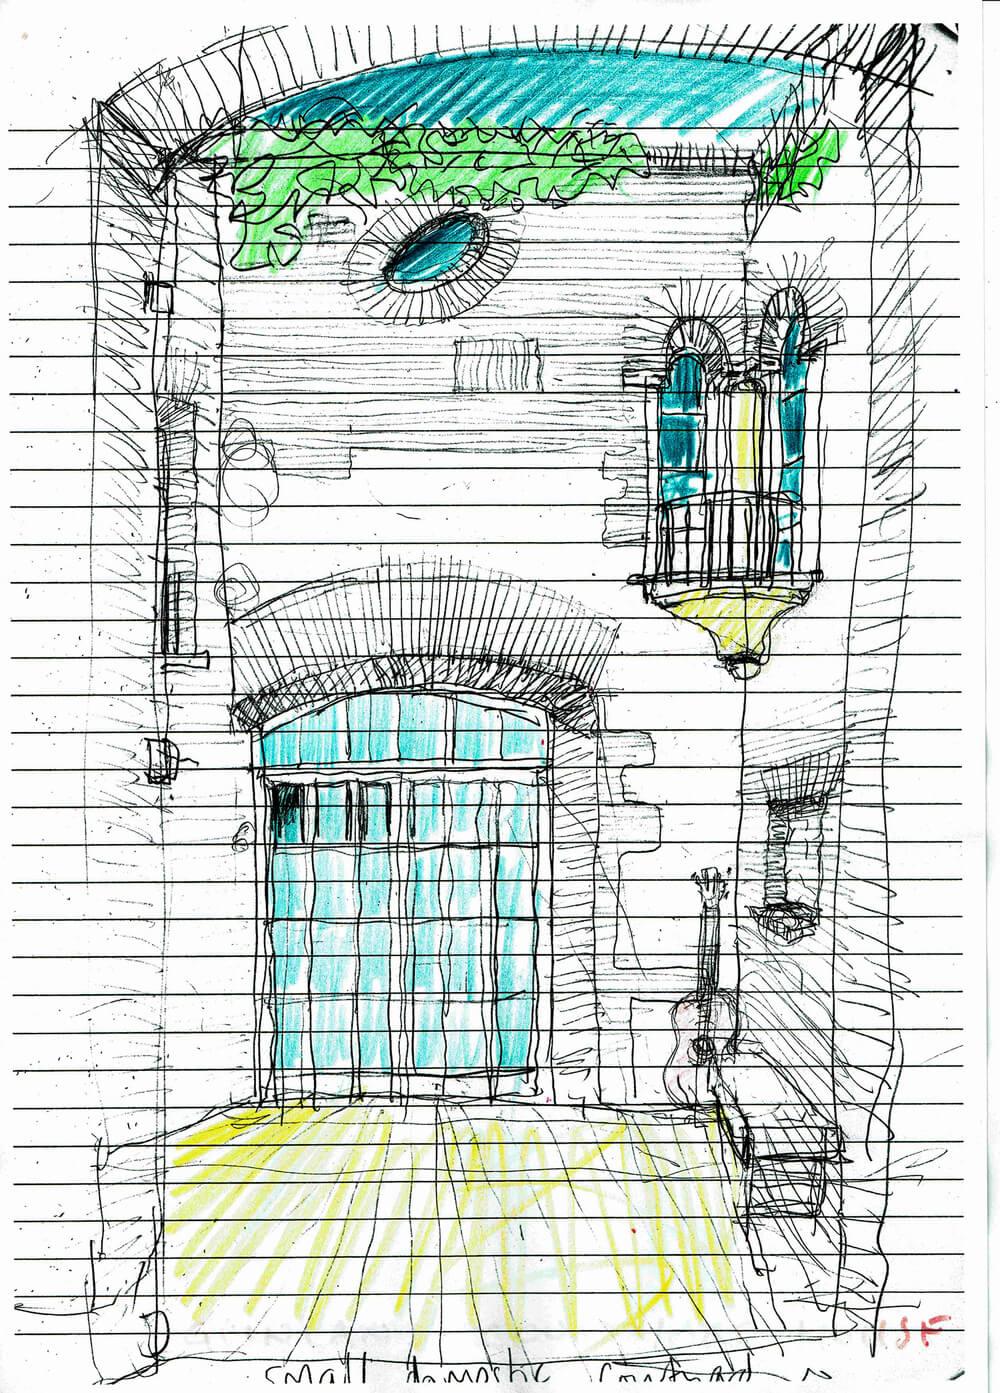 Small+Domestic+Courtyard+Coldbath.jpg